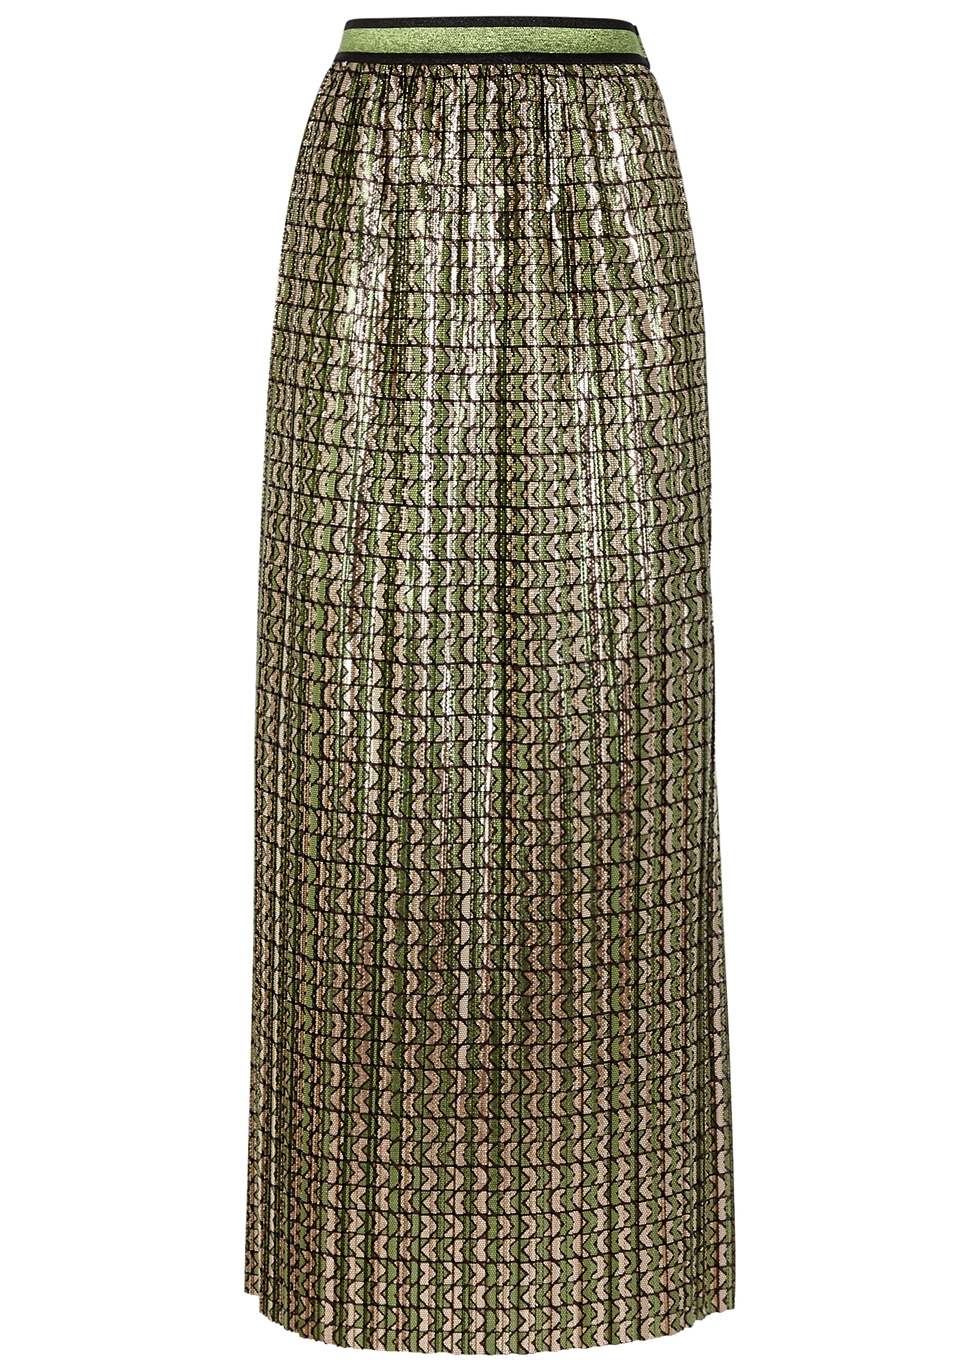 Printed metallic plissé skirt